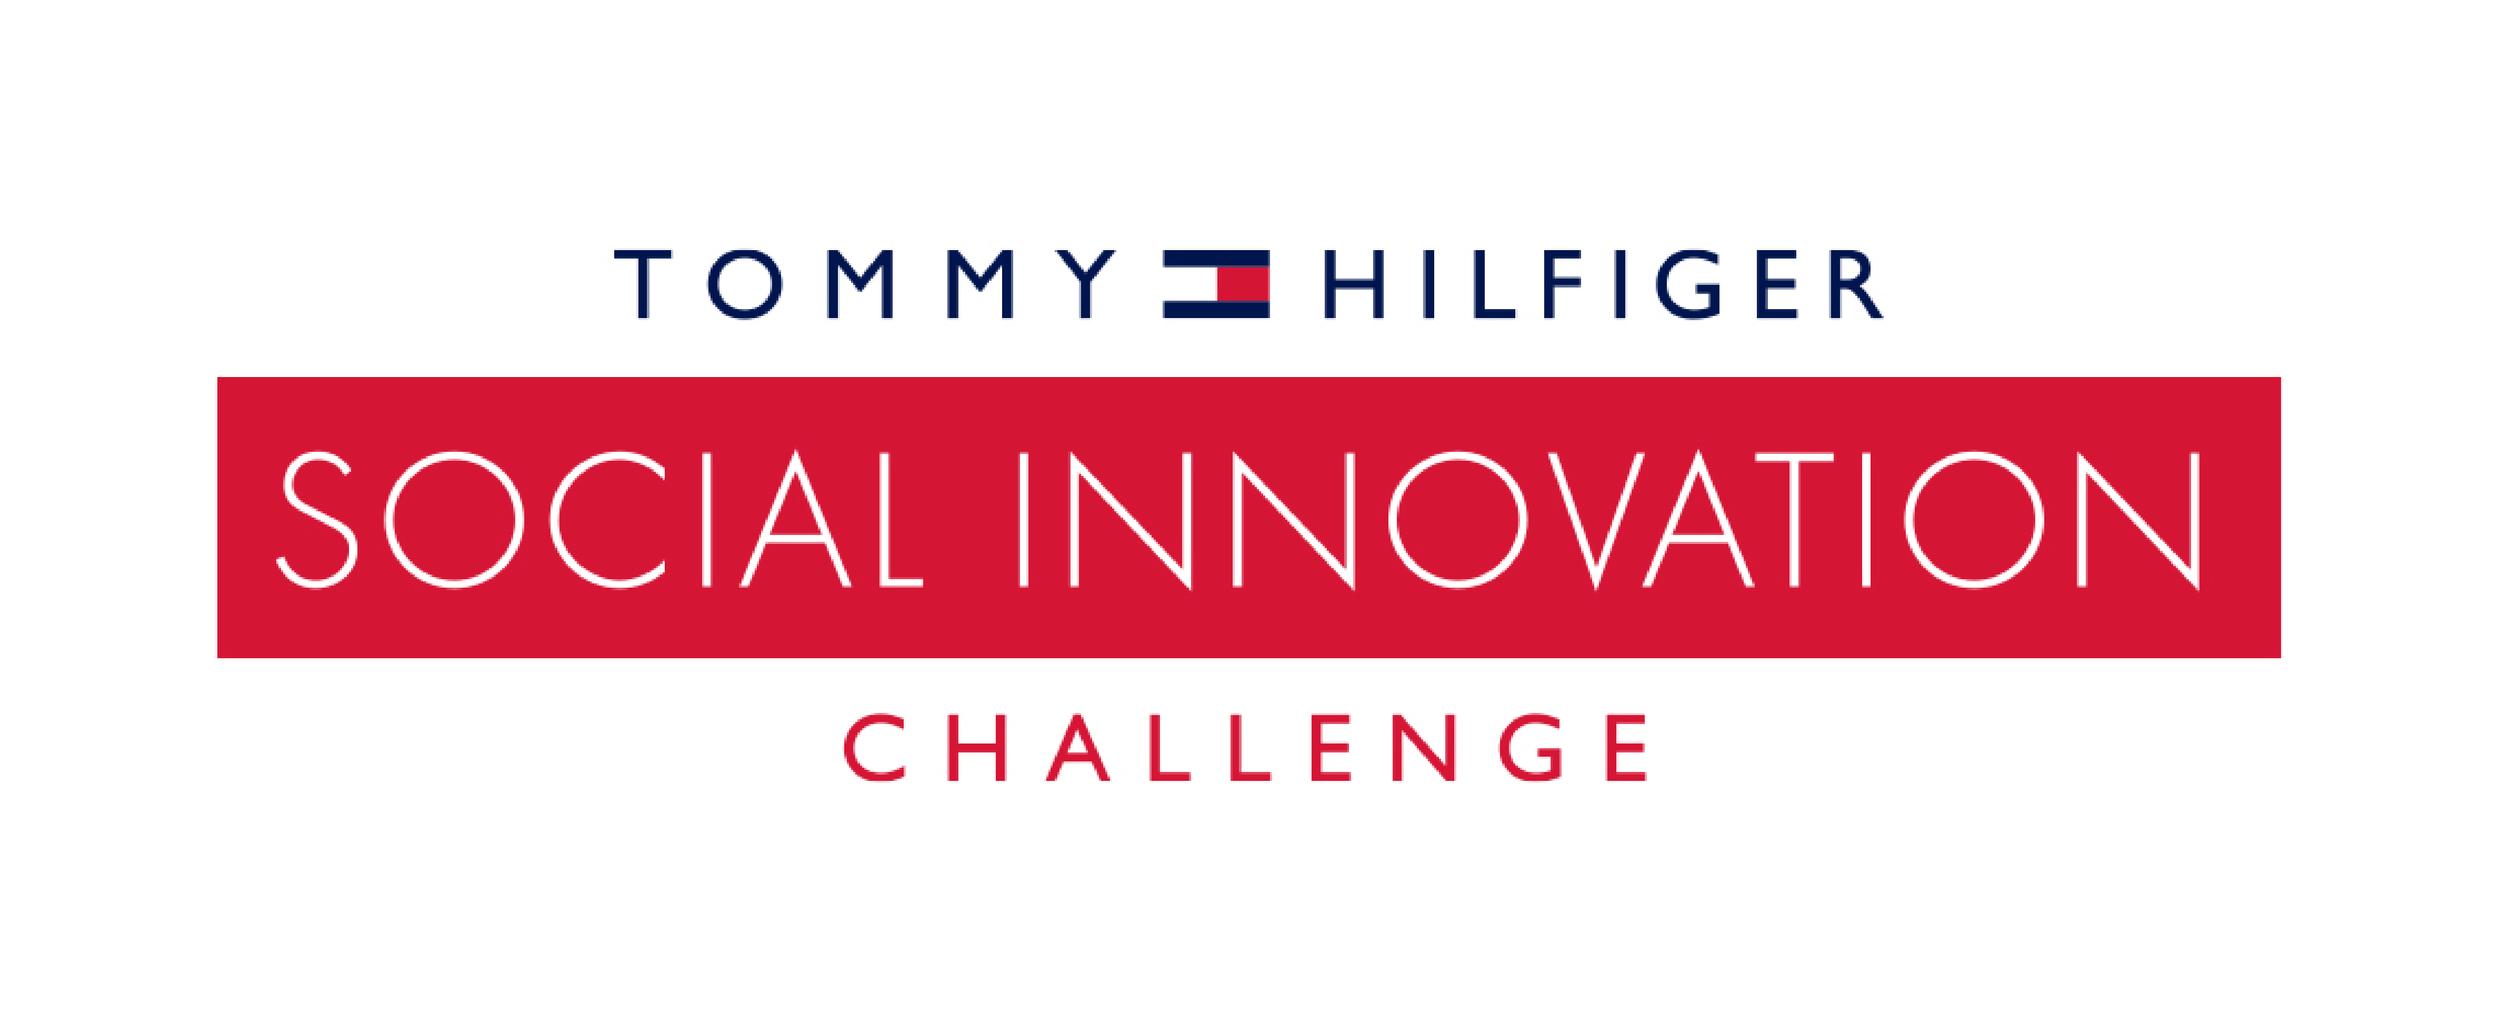 1140-470-Tommy-Hilfiger-01.pnghttps://amsterdam.impacthub.net/tommy-hilfiger-social-innovation-challenge/